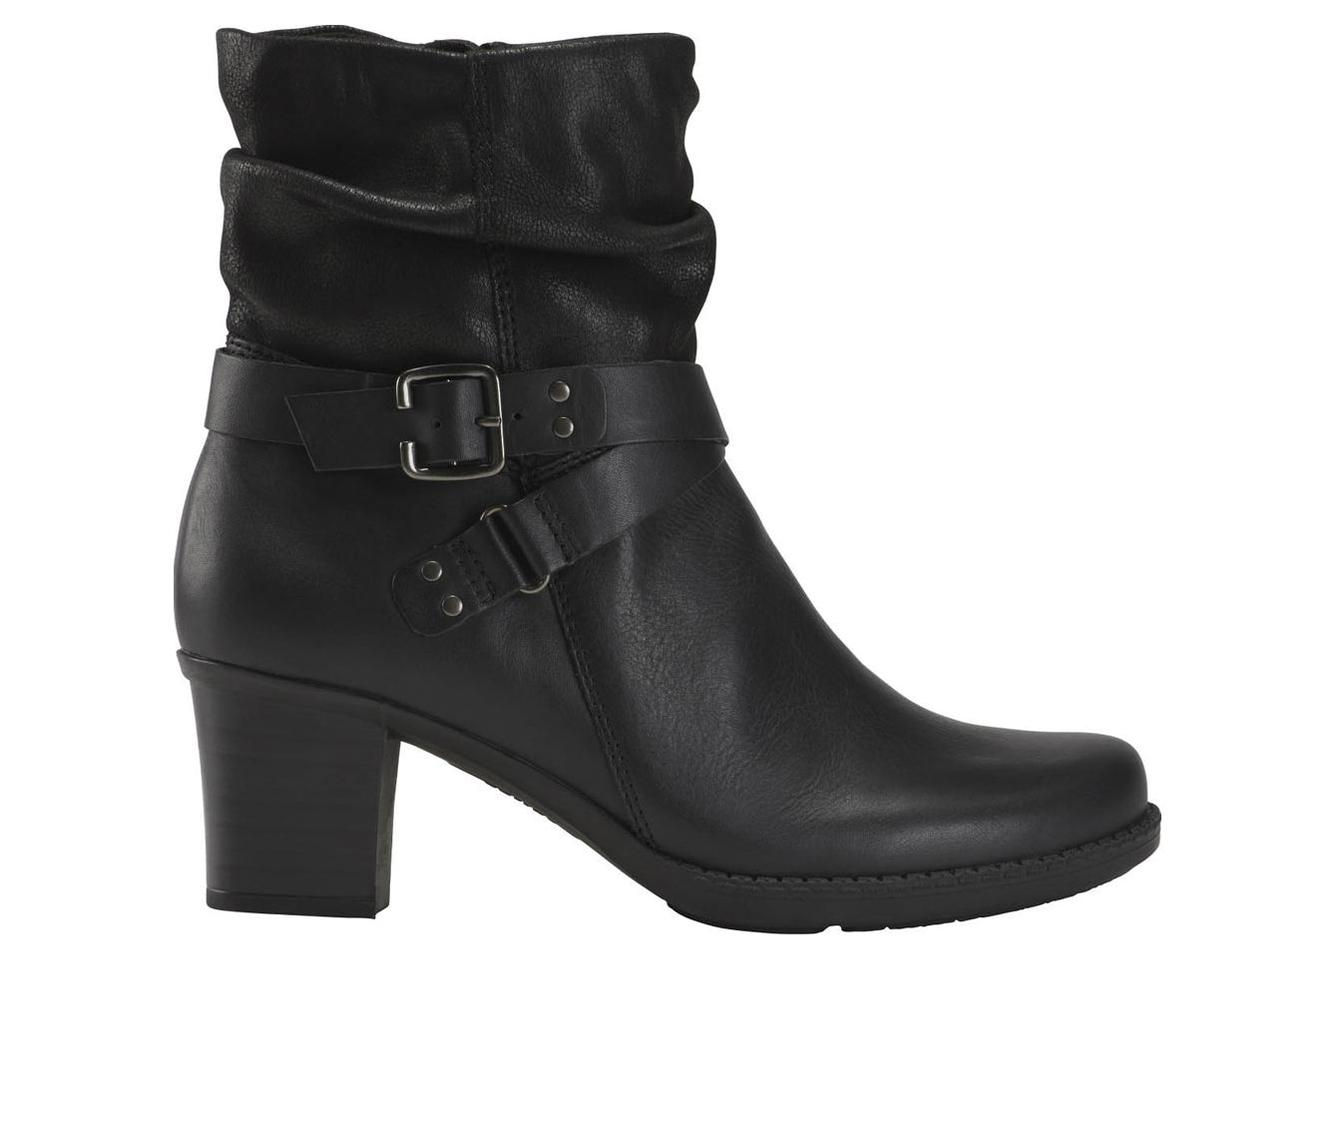 Earth Origins Wheaton Wade Women's Boots (Black - Leather)